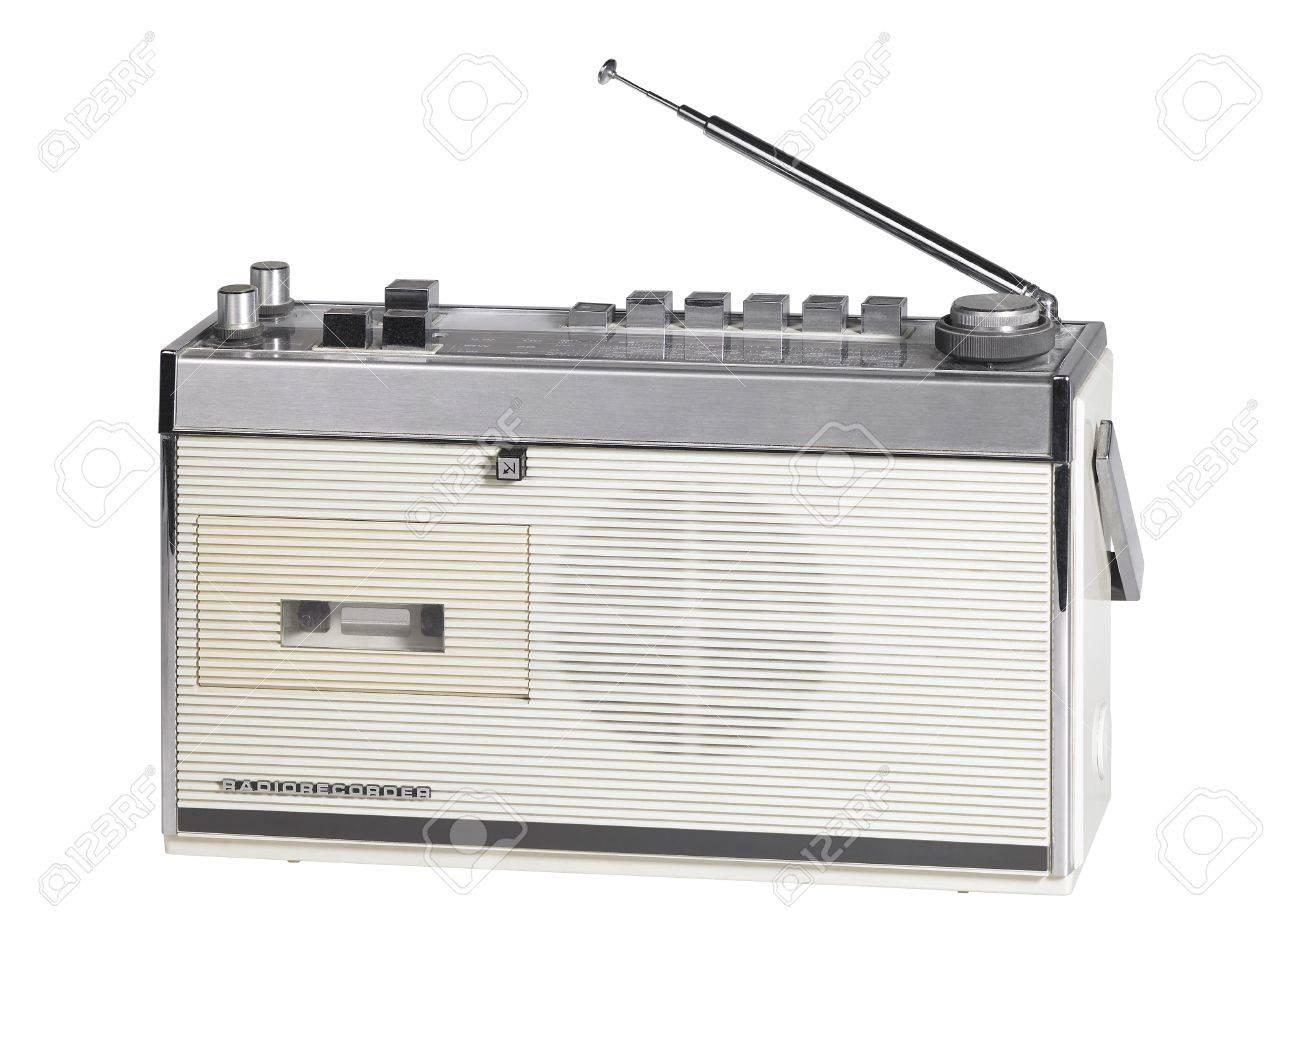 studio shot of a old nostalgic radio Stock Photo - 10914108